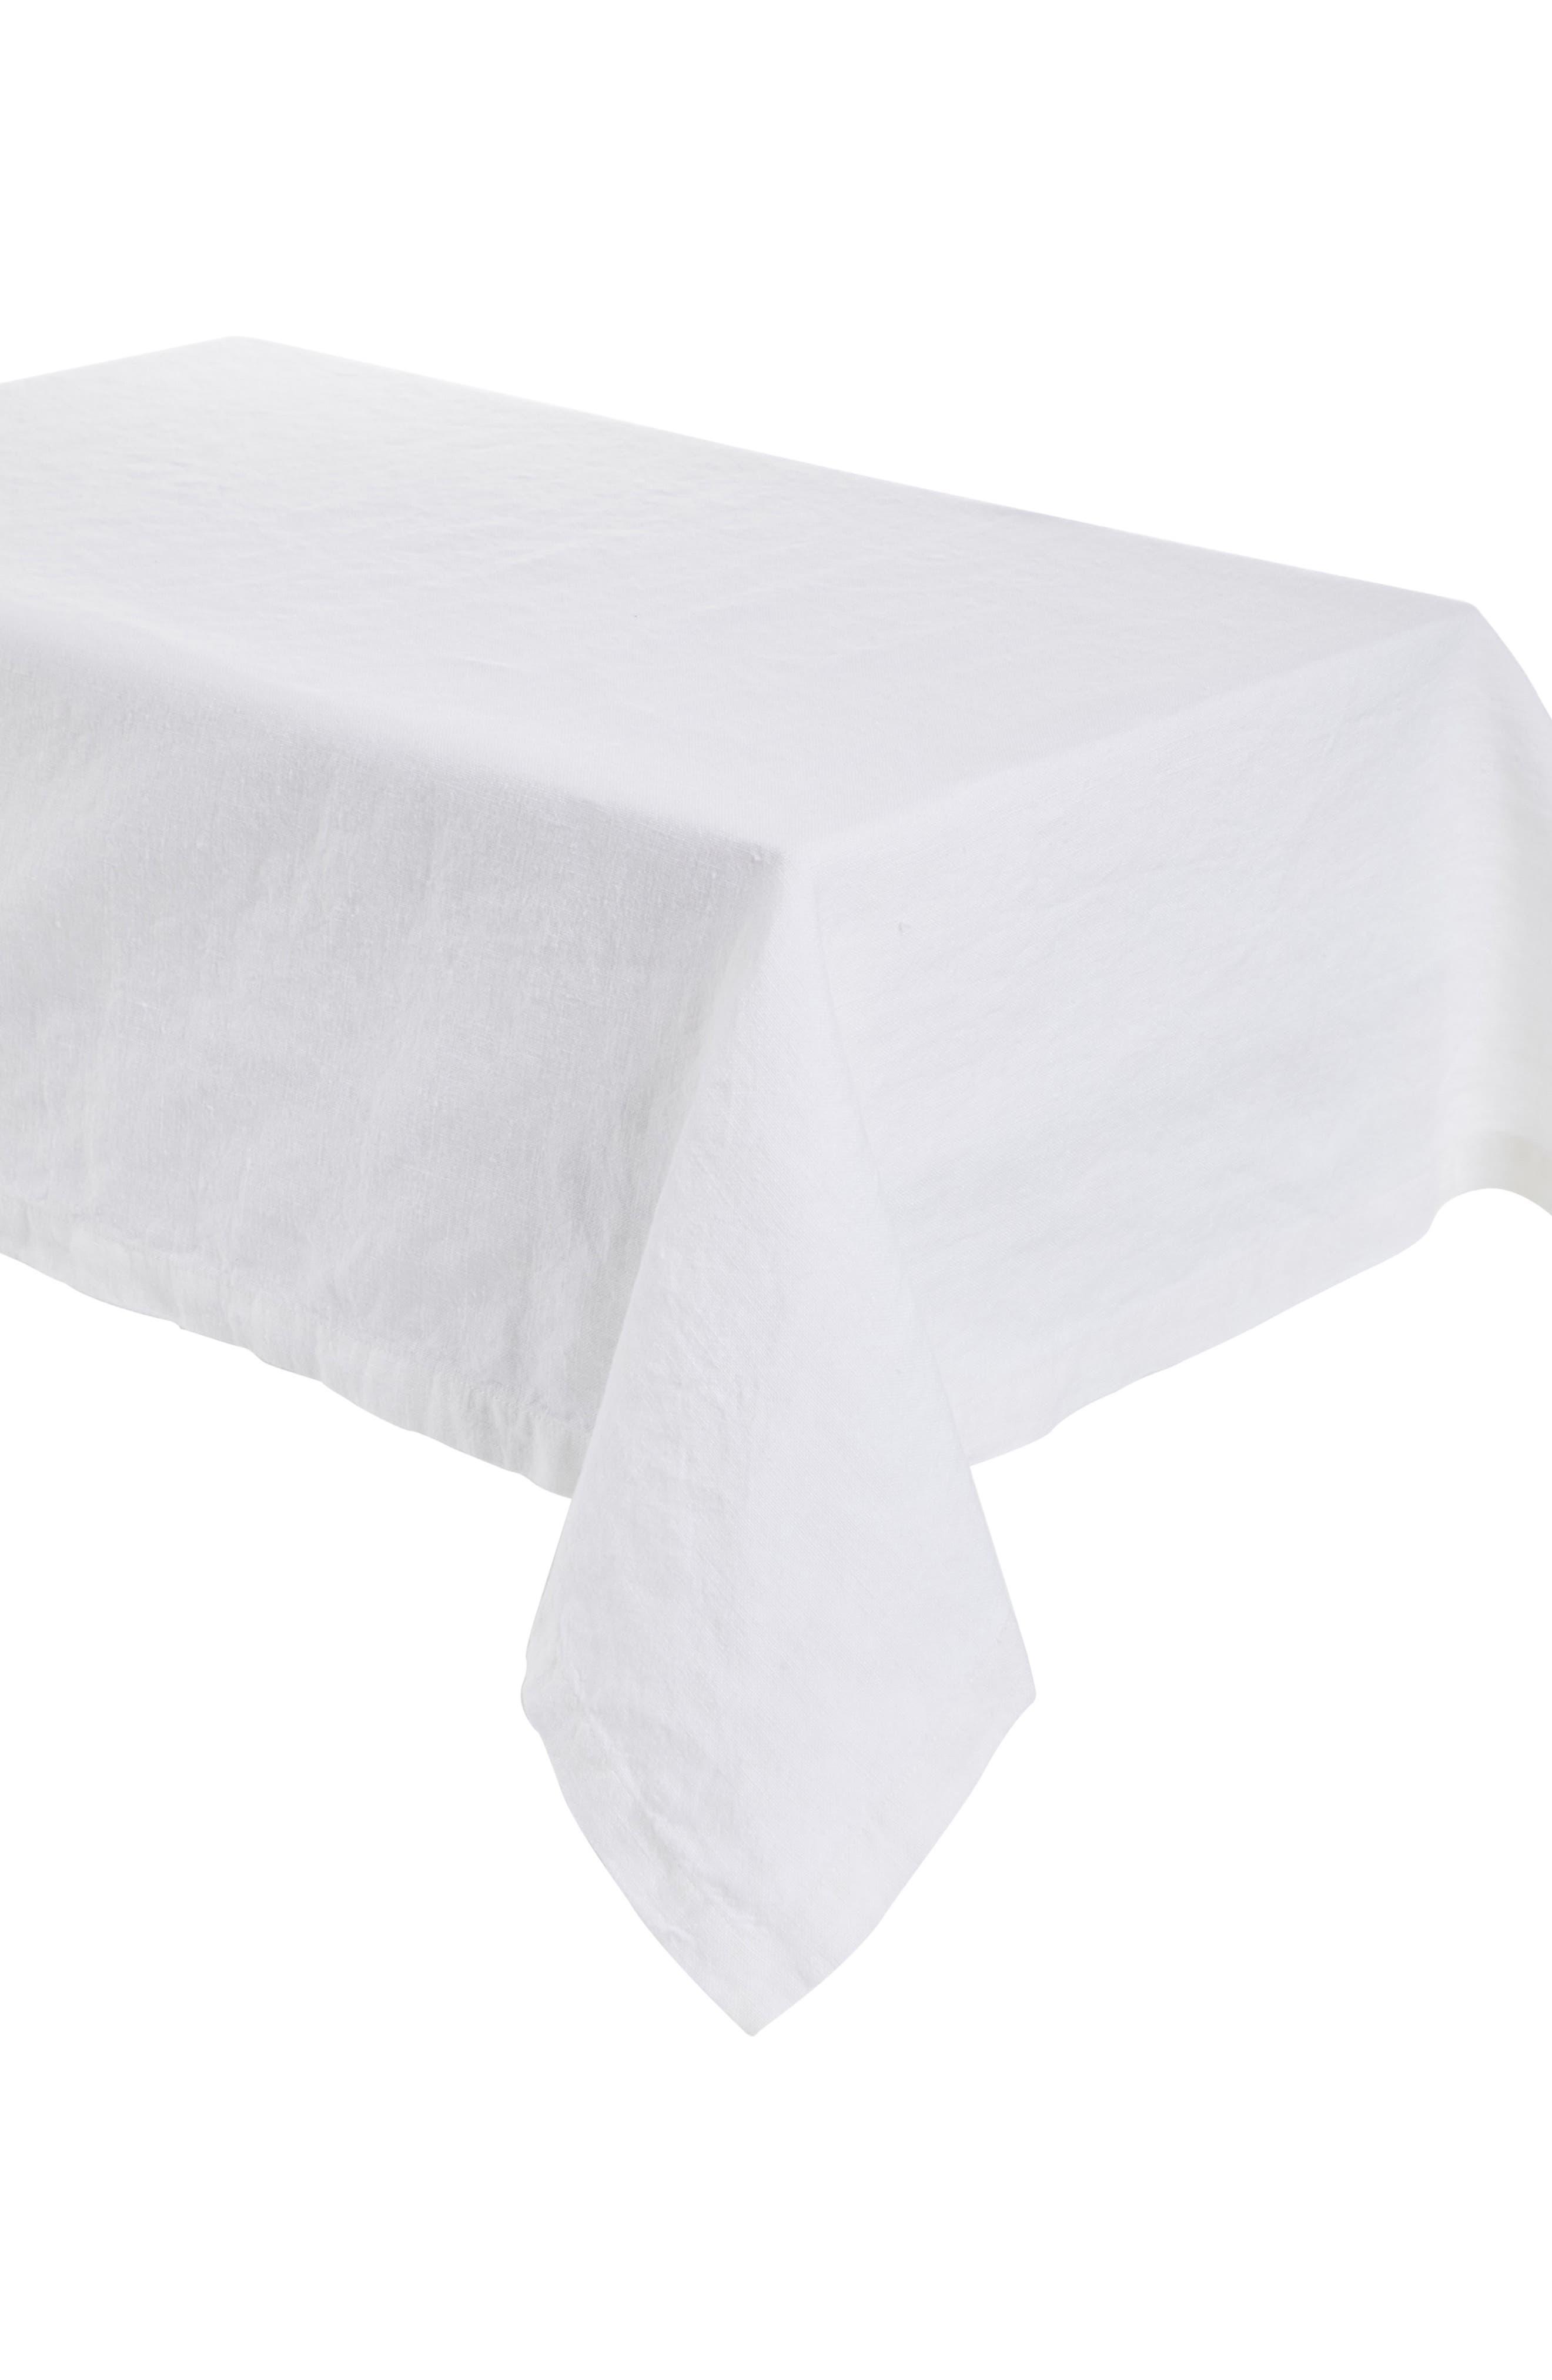 Nordstrom Tablecloths